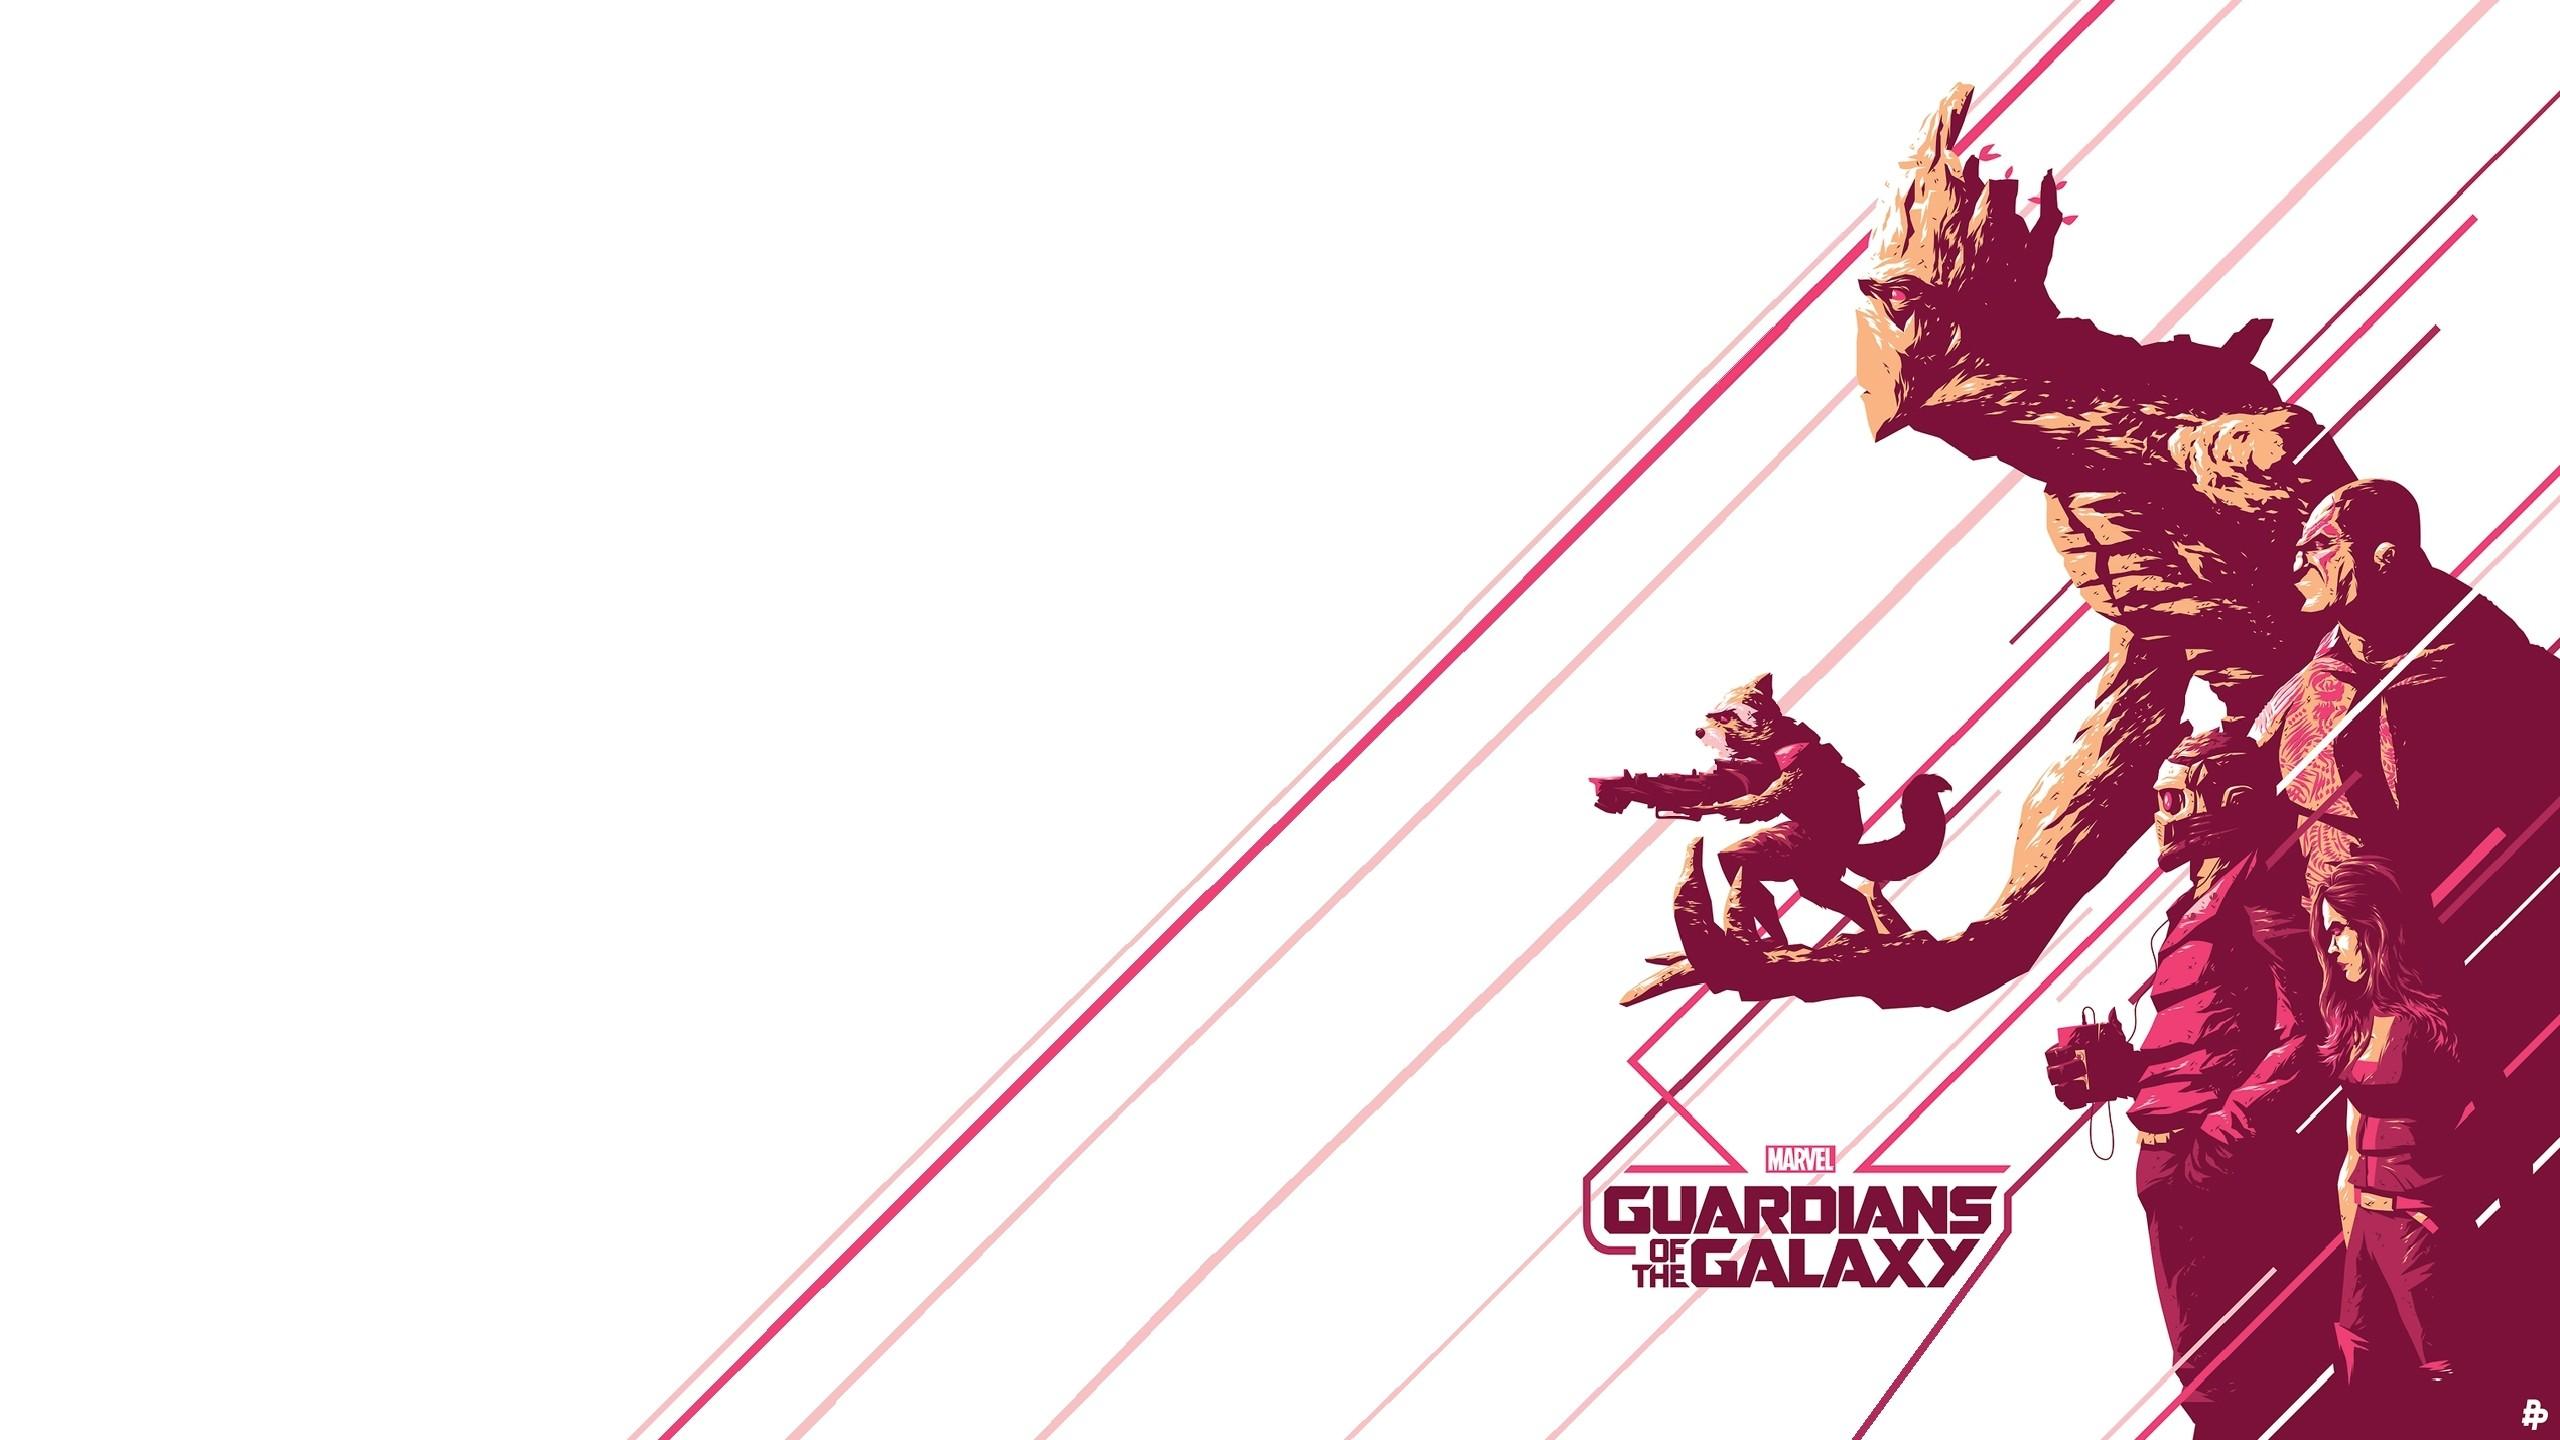 Top Wallpaper Marvel Star Lord - illustration-Marvel-Comics-Gamora-Guardians-of-the-Galaxy-Groot-Rocket-Raccoon-Star-Lord-line-208270  Picture_316450.jpg